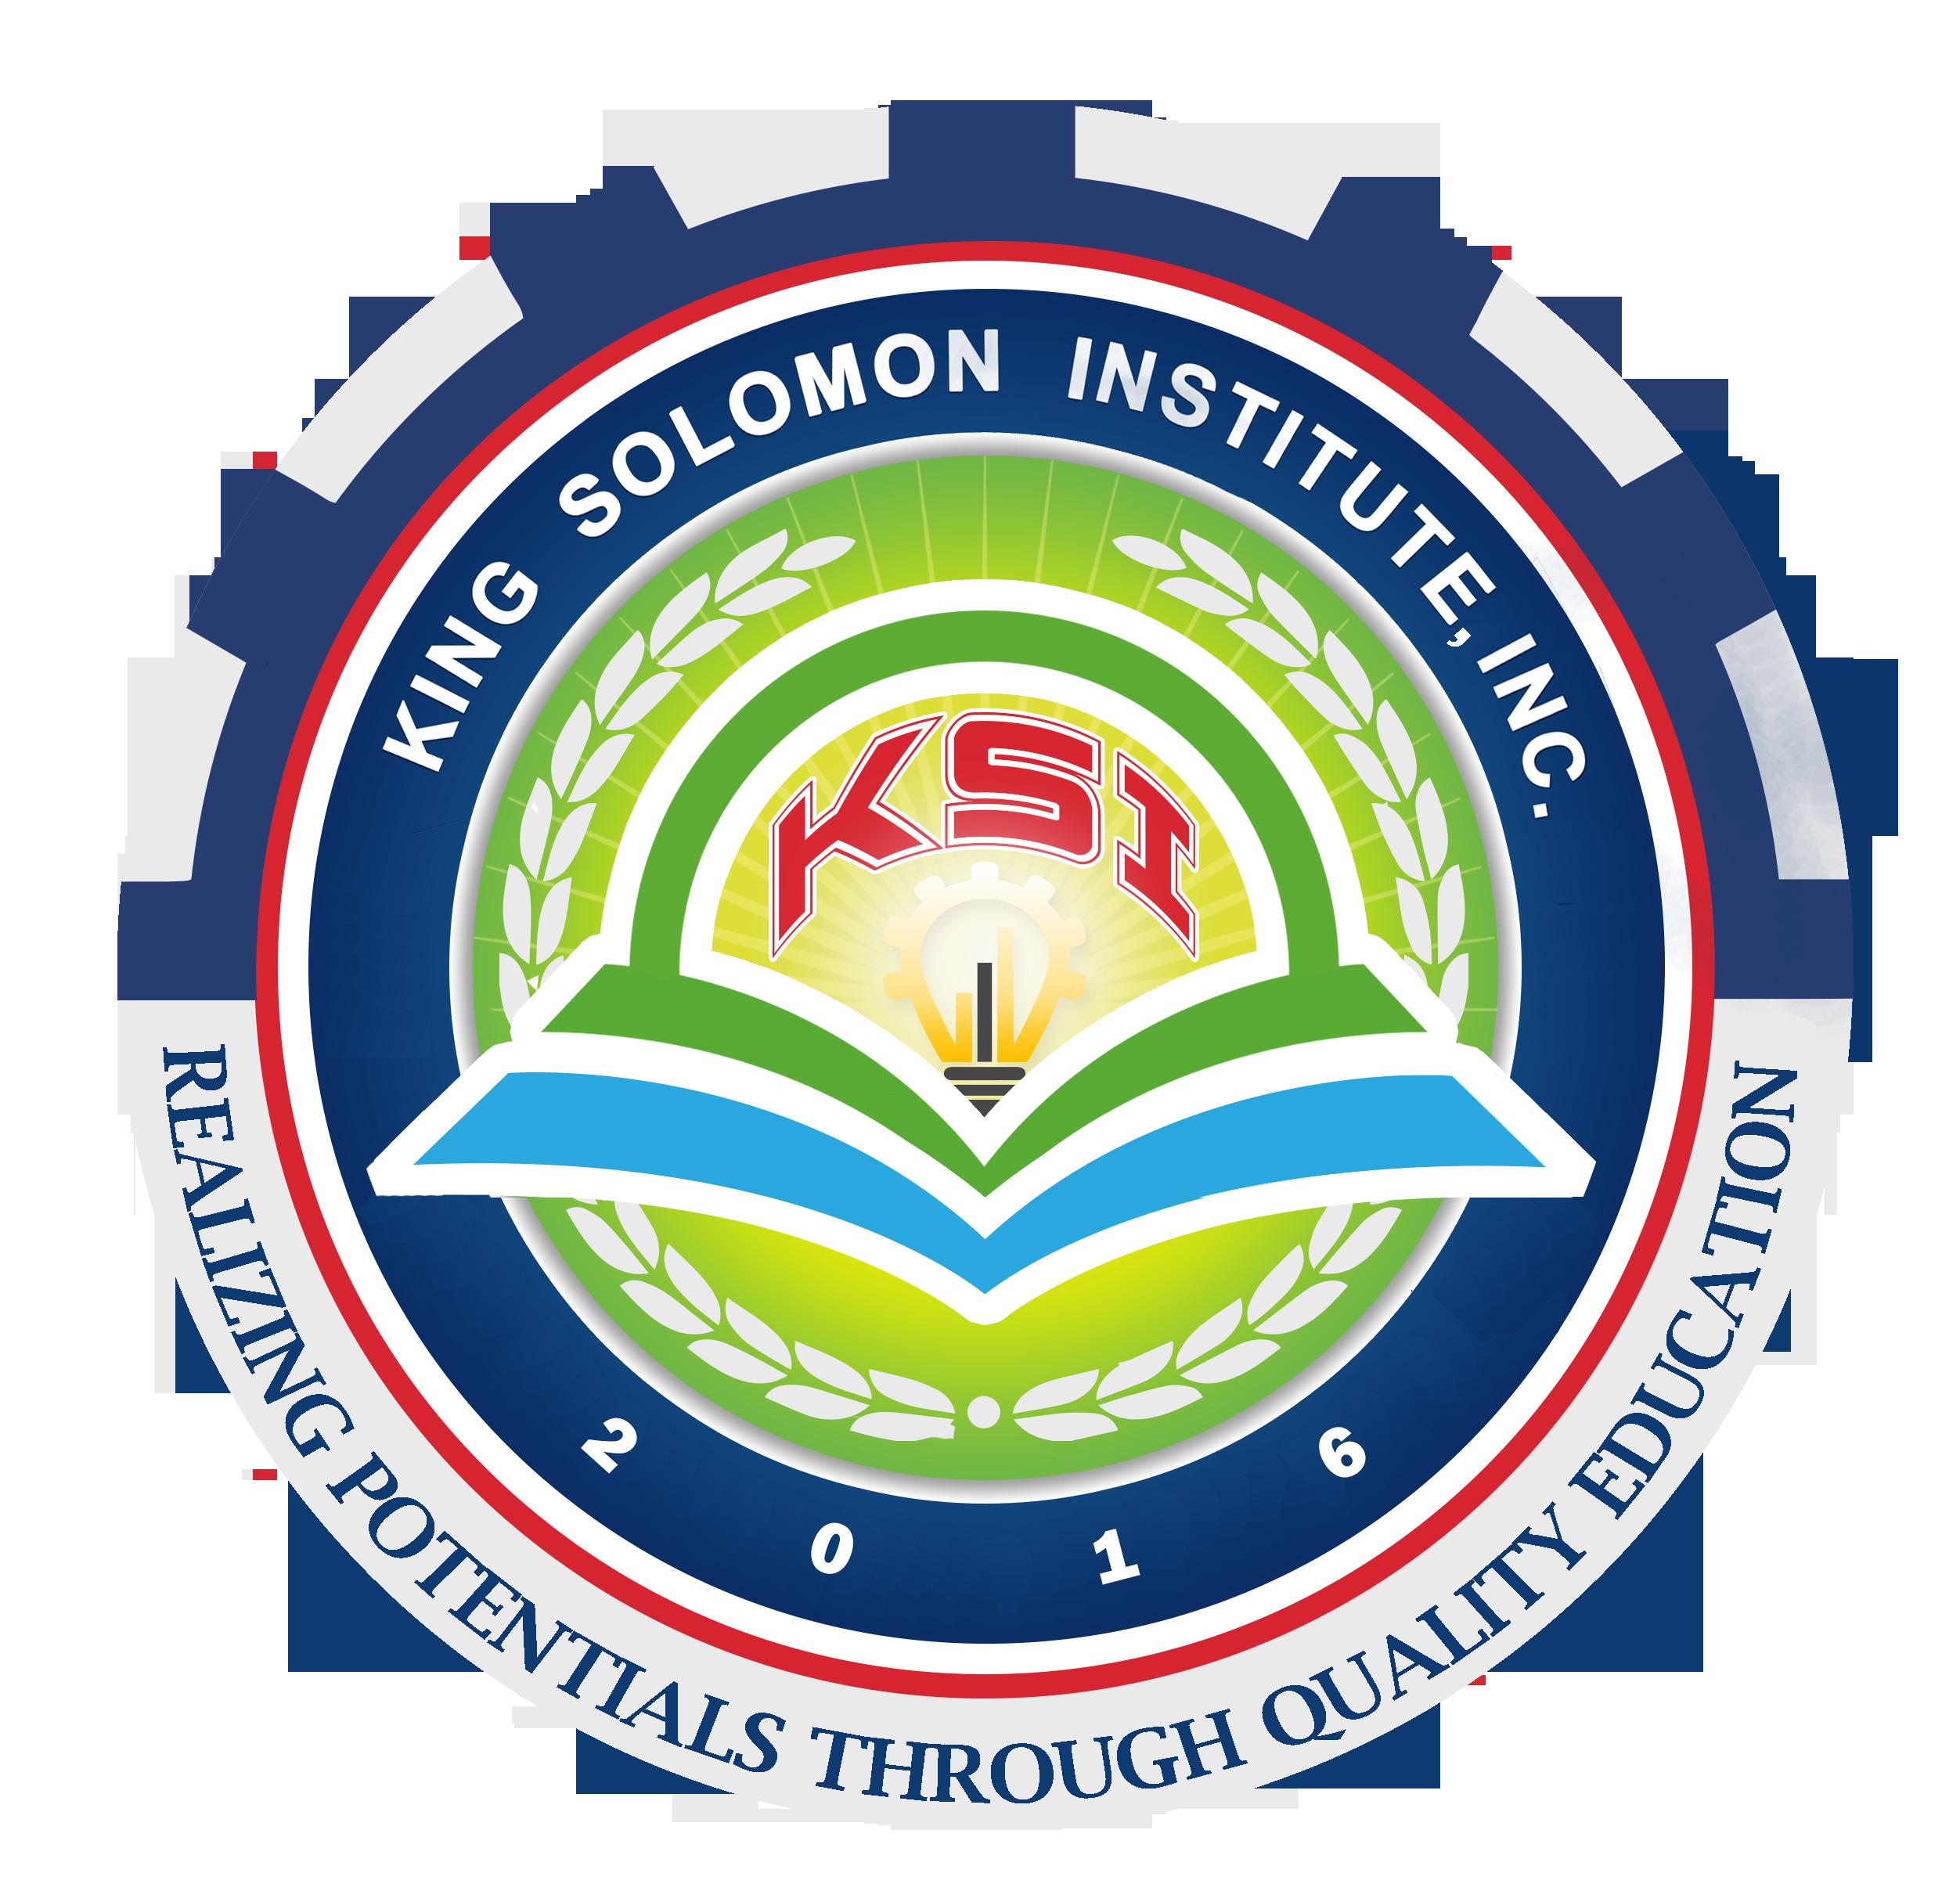 King Solomon Institute Academy,Inc. Logo